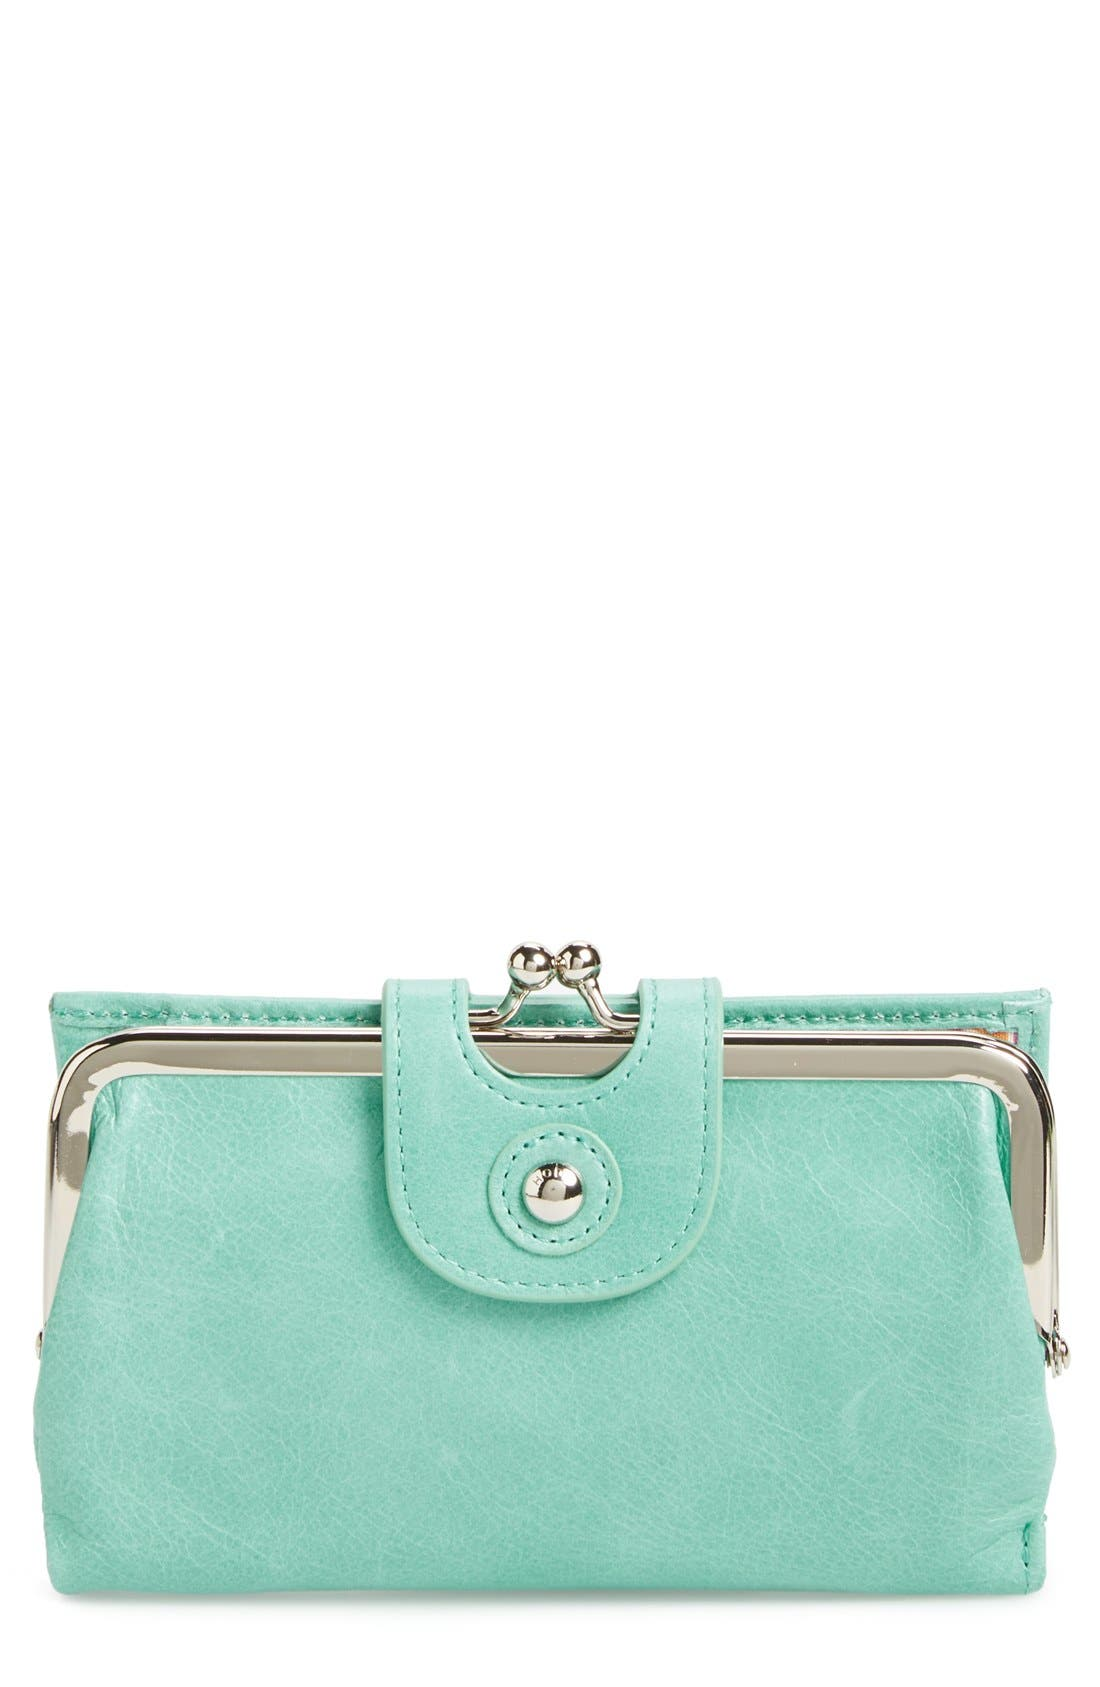 Main Image - Hobo 'Alice' Leather Wallet